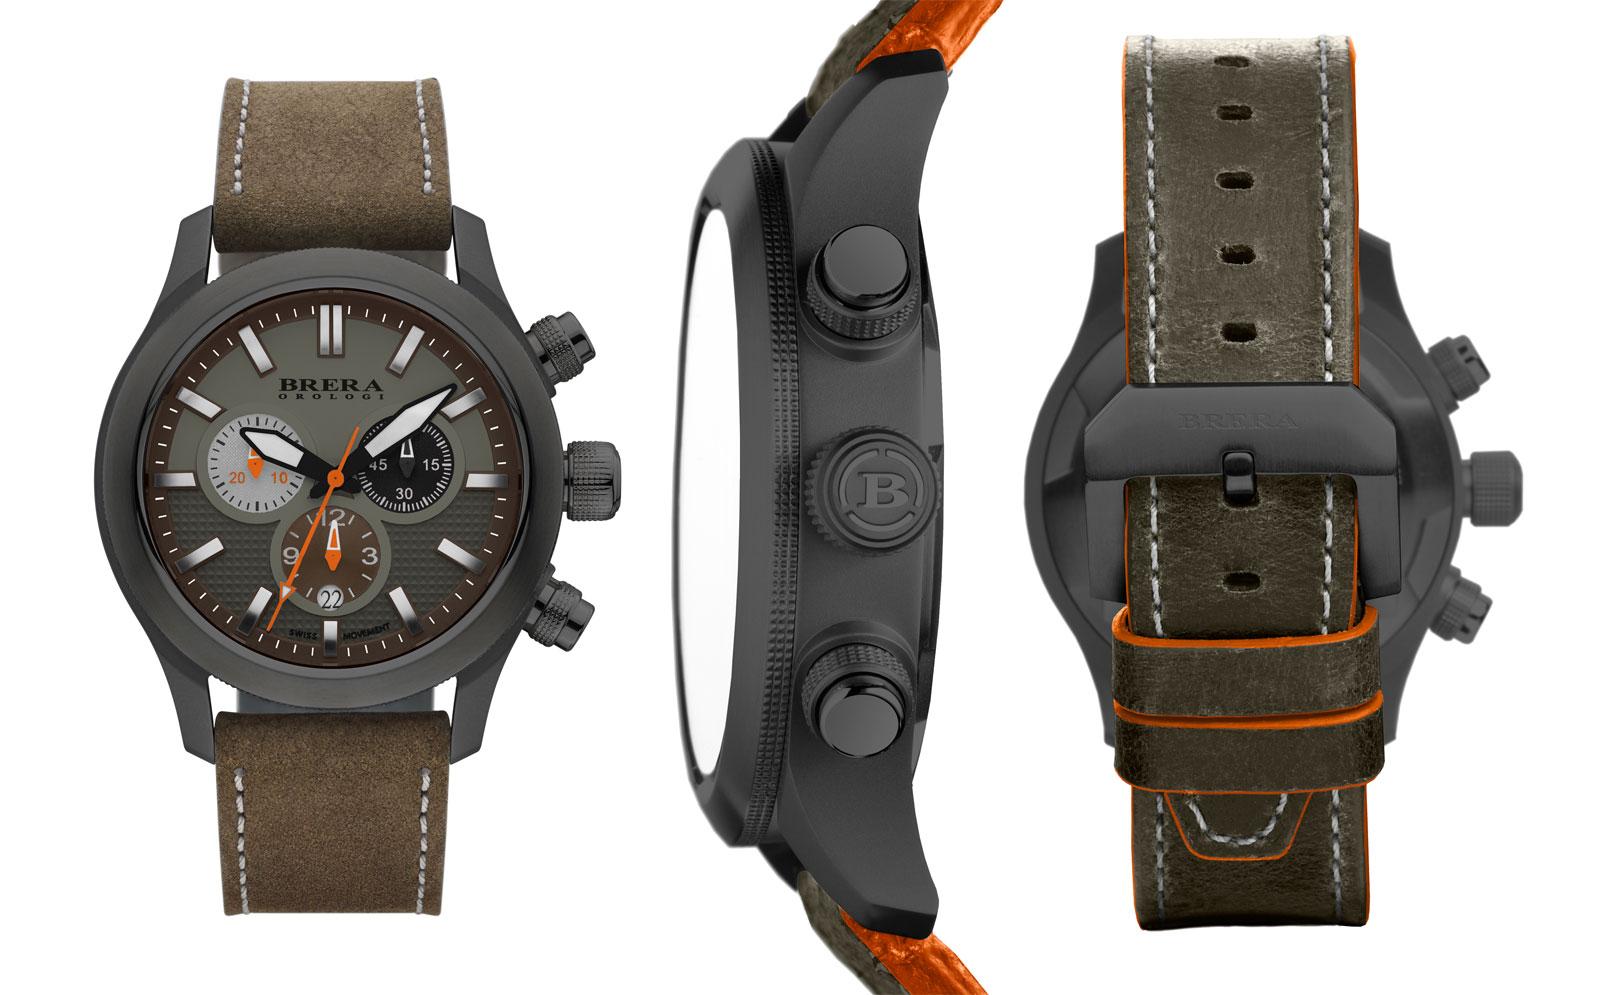 Brera Orologi Watches - Italian Design With A Swiss Heart 4